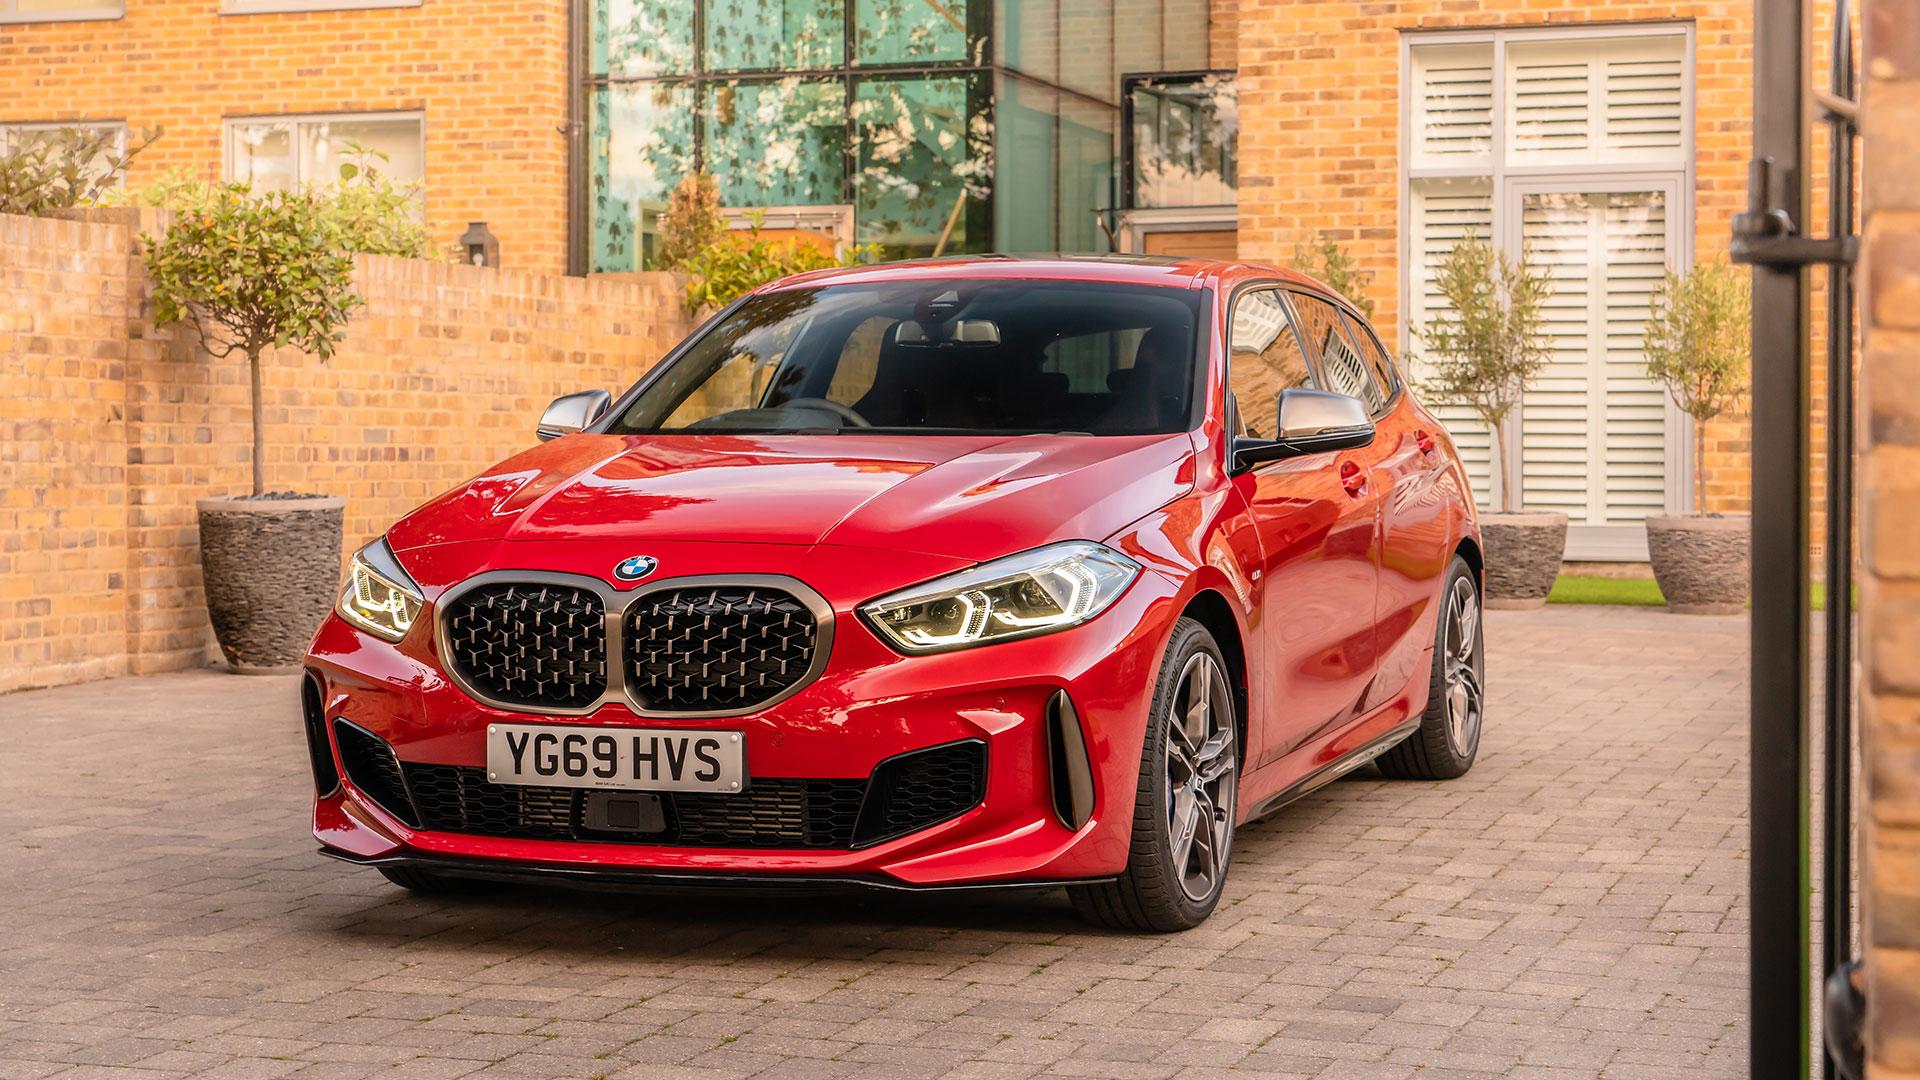 Bmw 1 Series Hatchback 2019 Review Auto Trader Uk